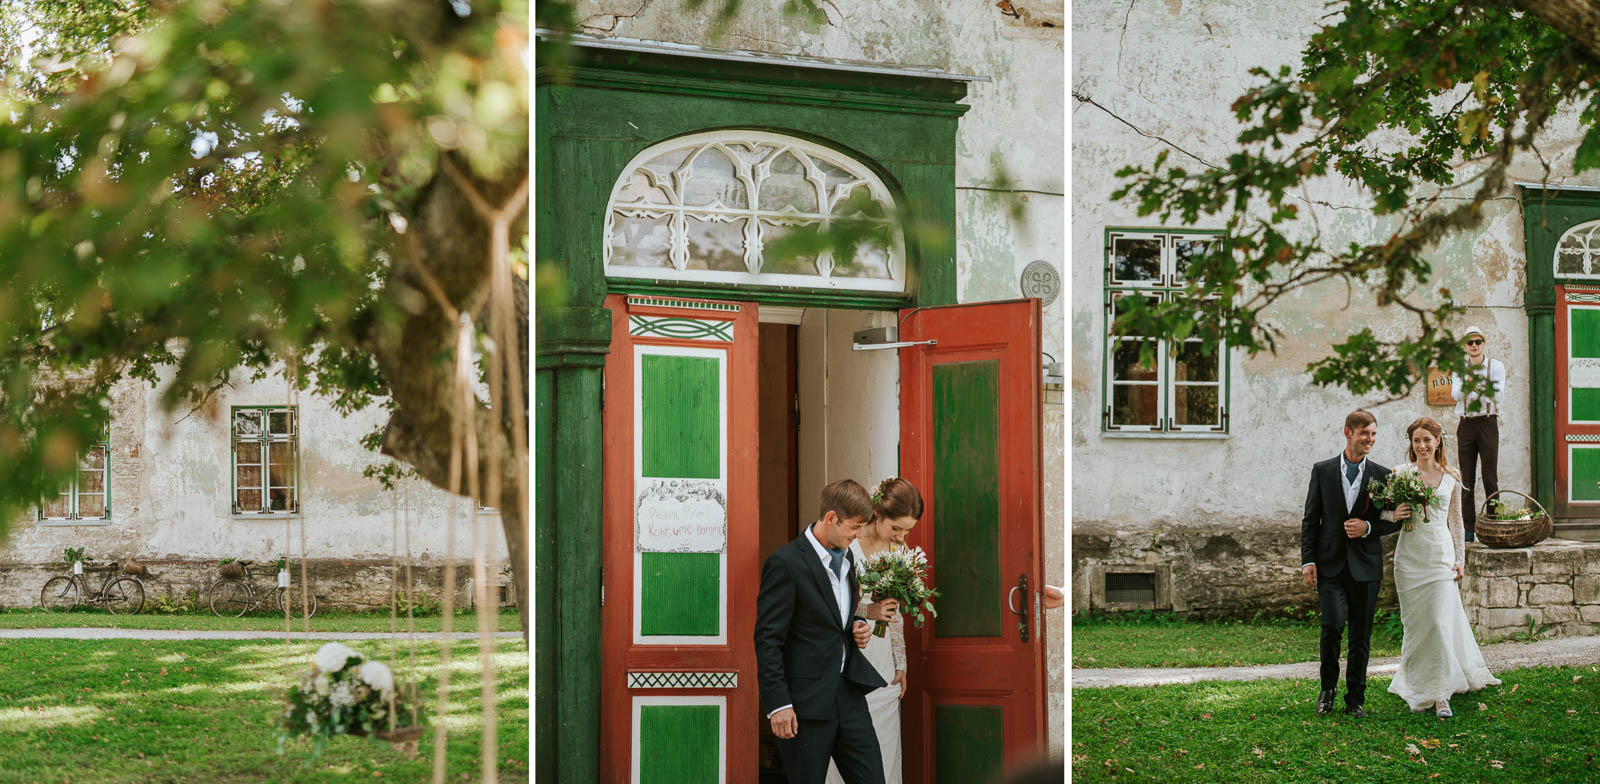 Pohjaka_mois_manor_pulm_wedding_Mait_Juriado-17